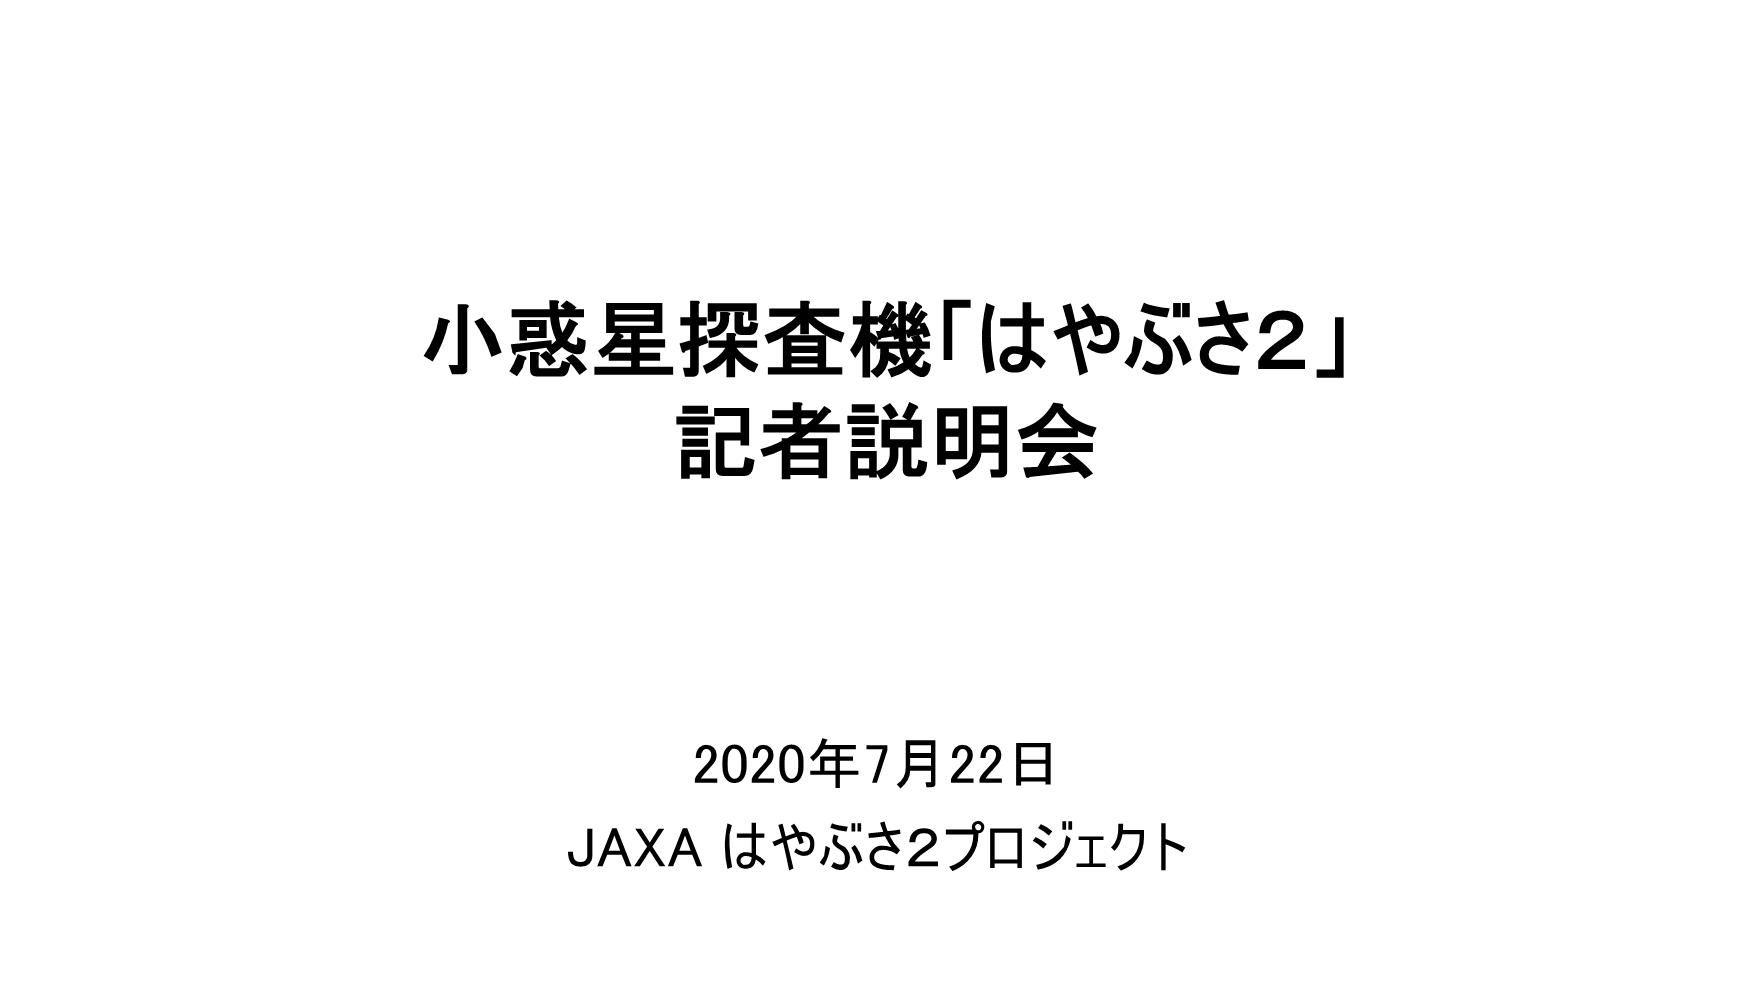 f:id:Imamura:20200722140617p:plain